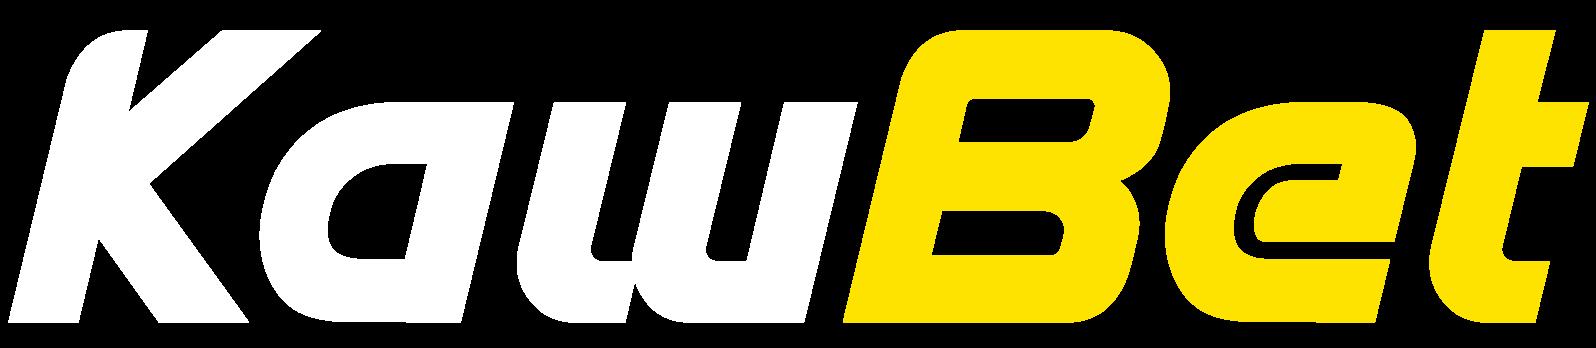 KawBetlogo